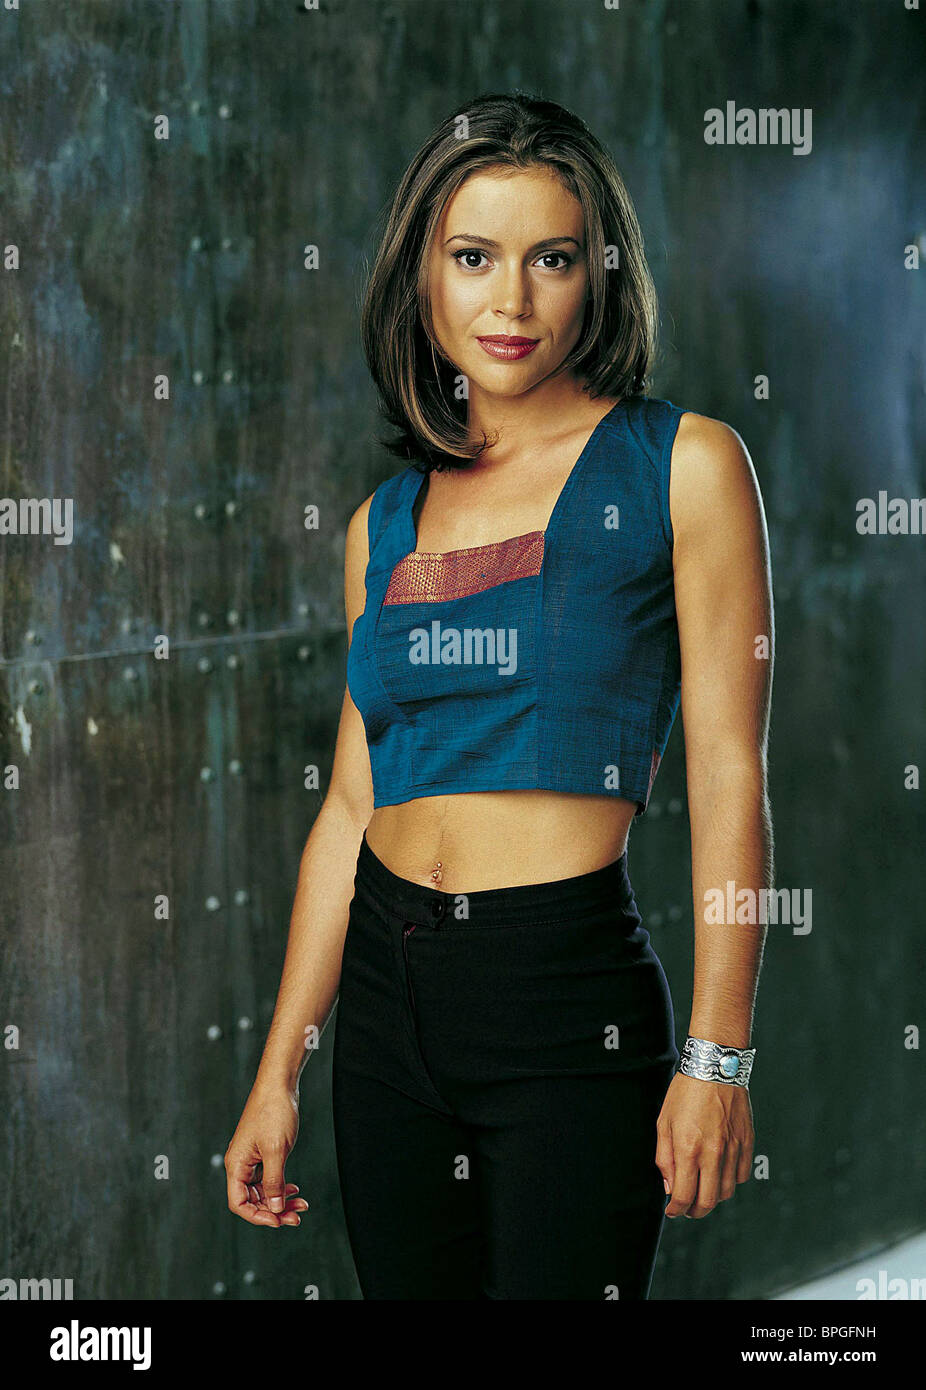 Alyssa Milano Charmed 1998 Stockfoto Bild 31096397 Alamy